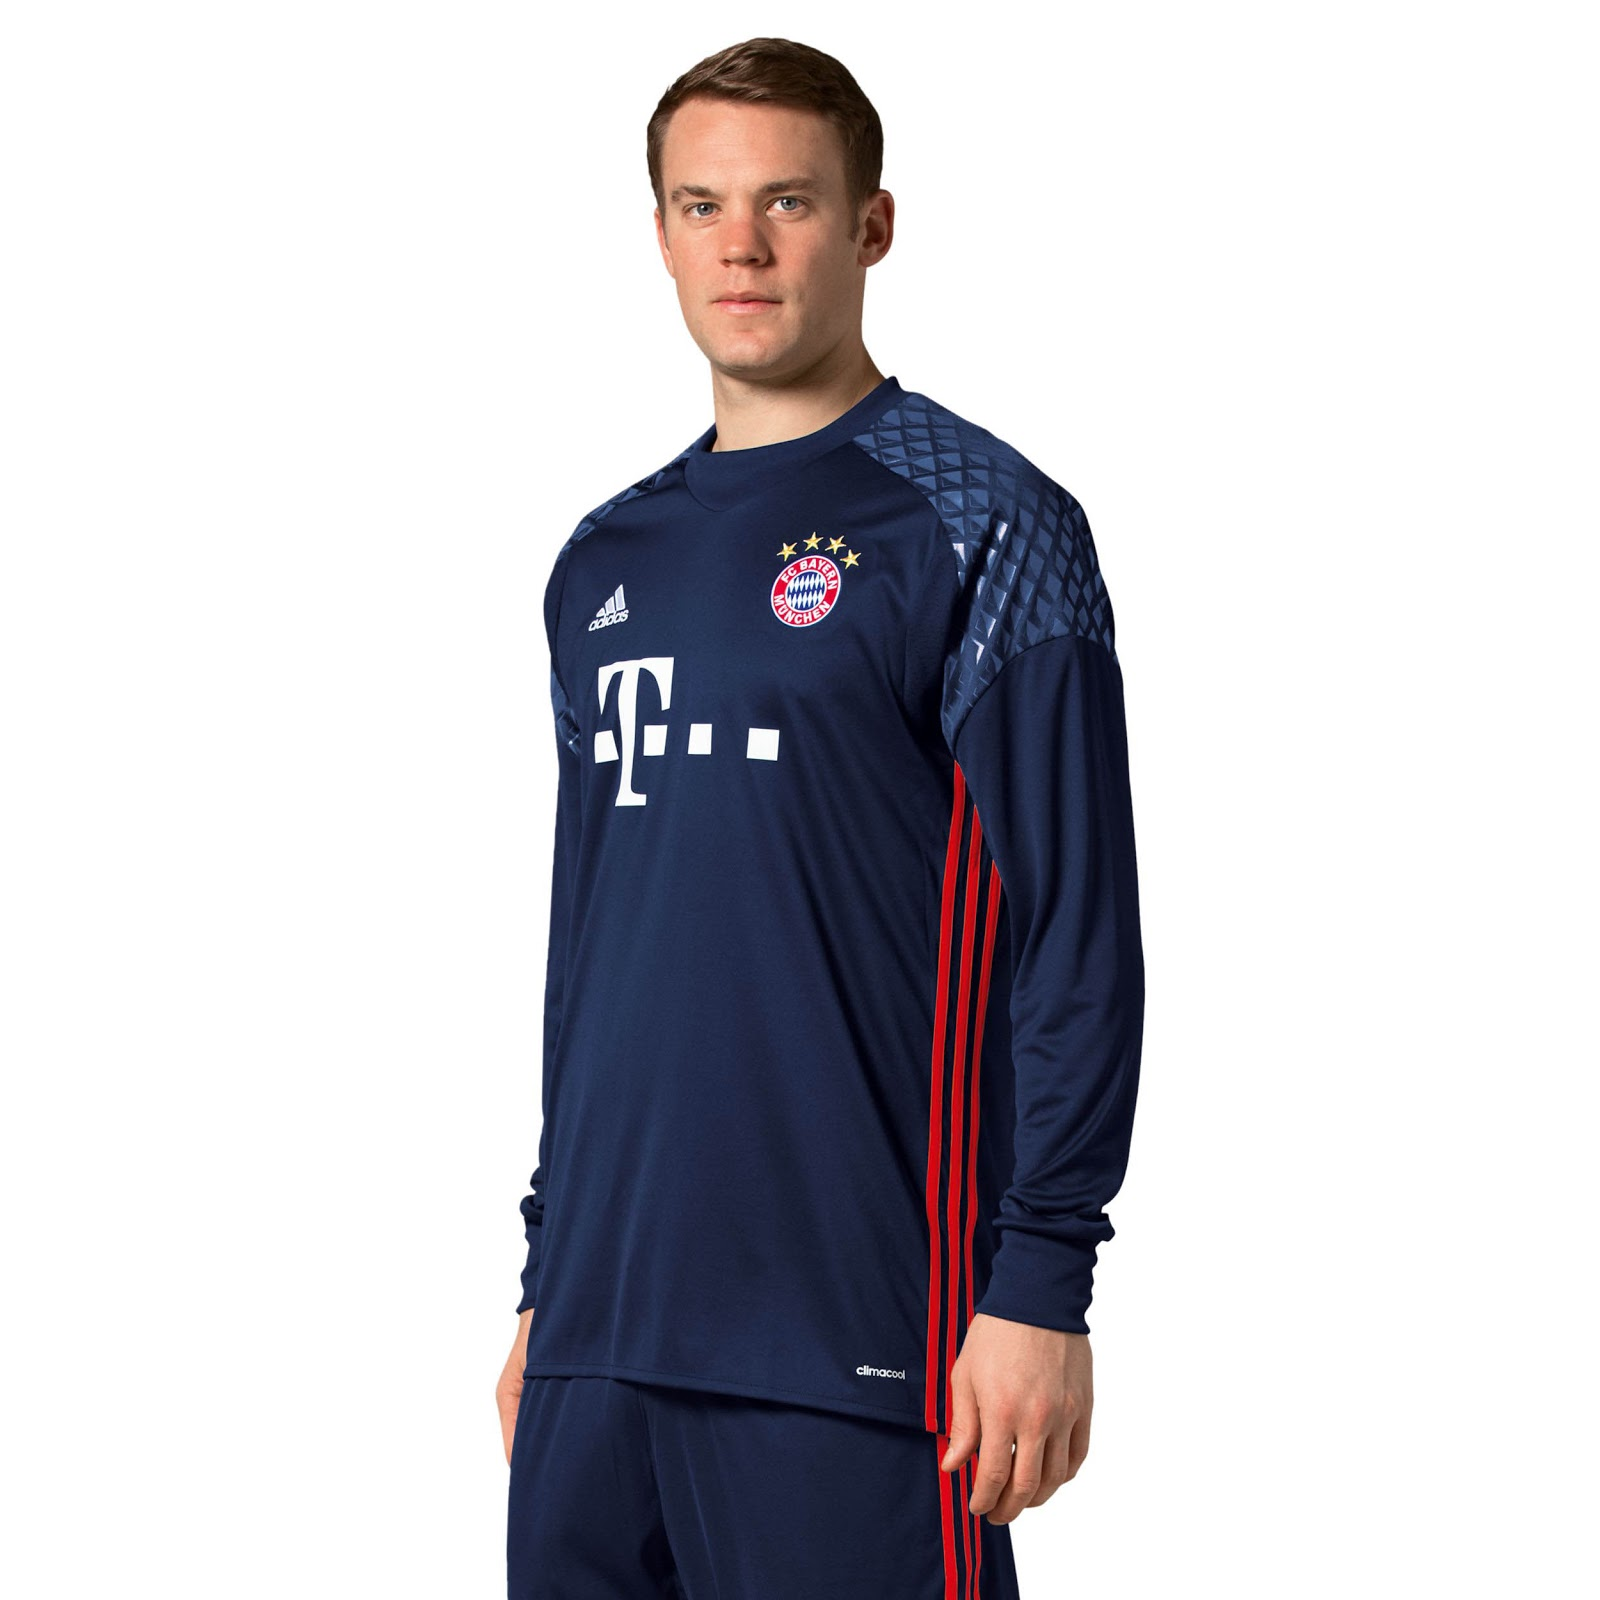 79d8e8109 Manuel To Wear Neuer Bayern 2016 17 Kit Today